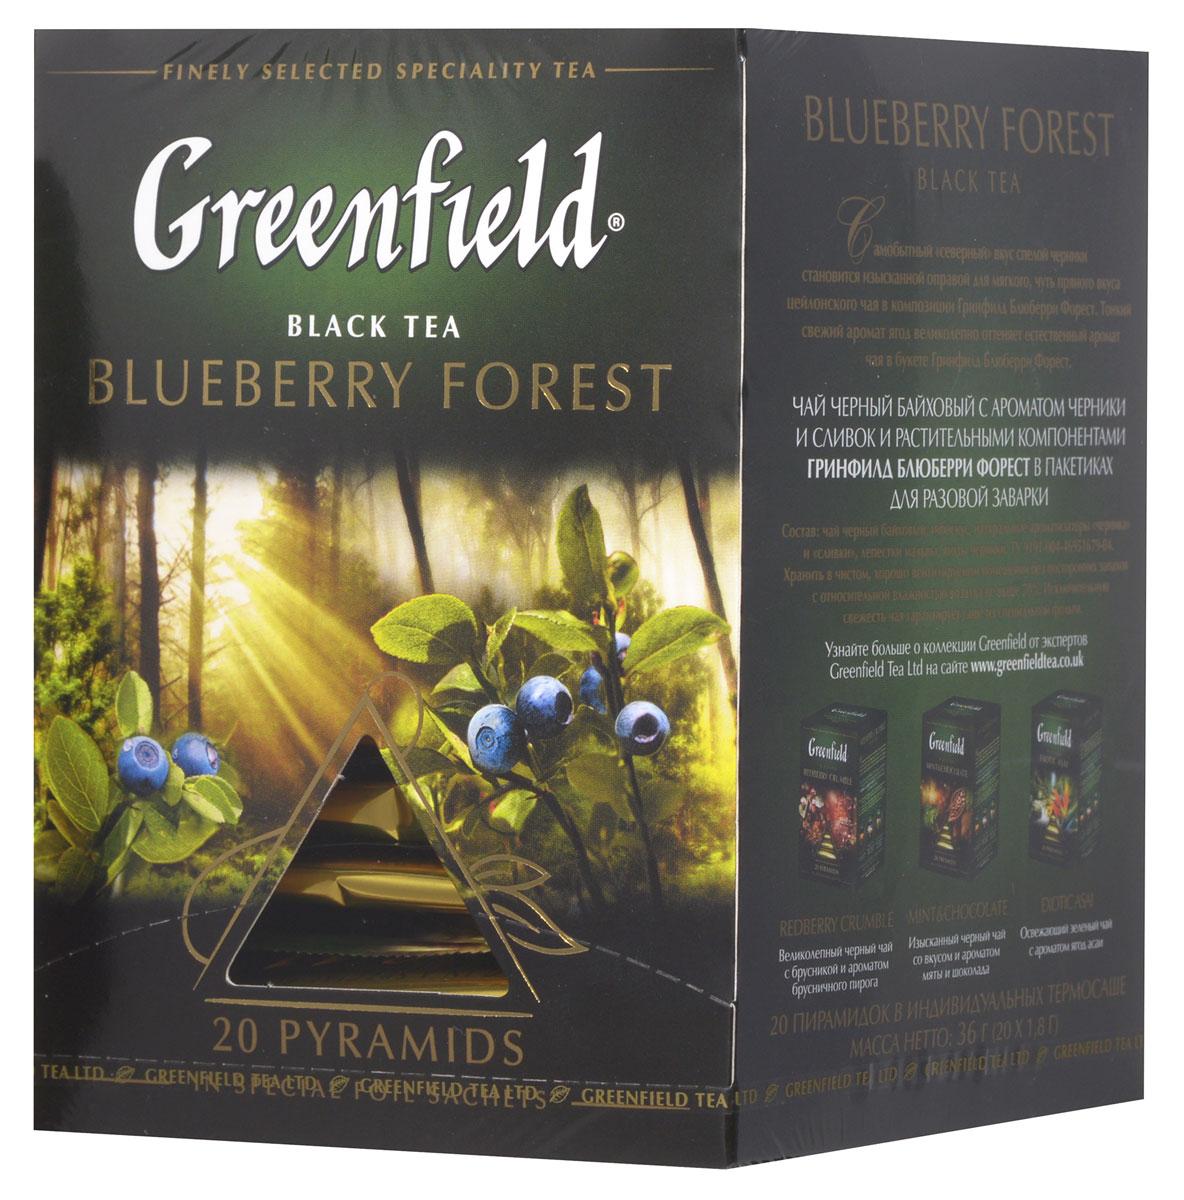 Greenfield Blueberry Forest черный чай в пирамидках, 20 шт greenfield blueberry forest черный листовой чай 250 г